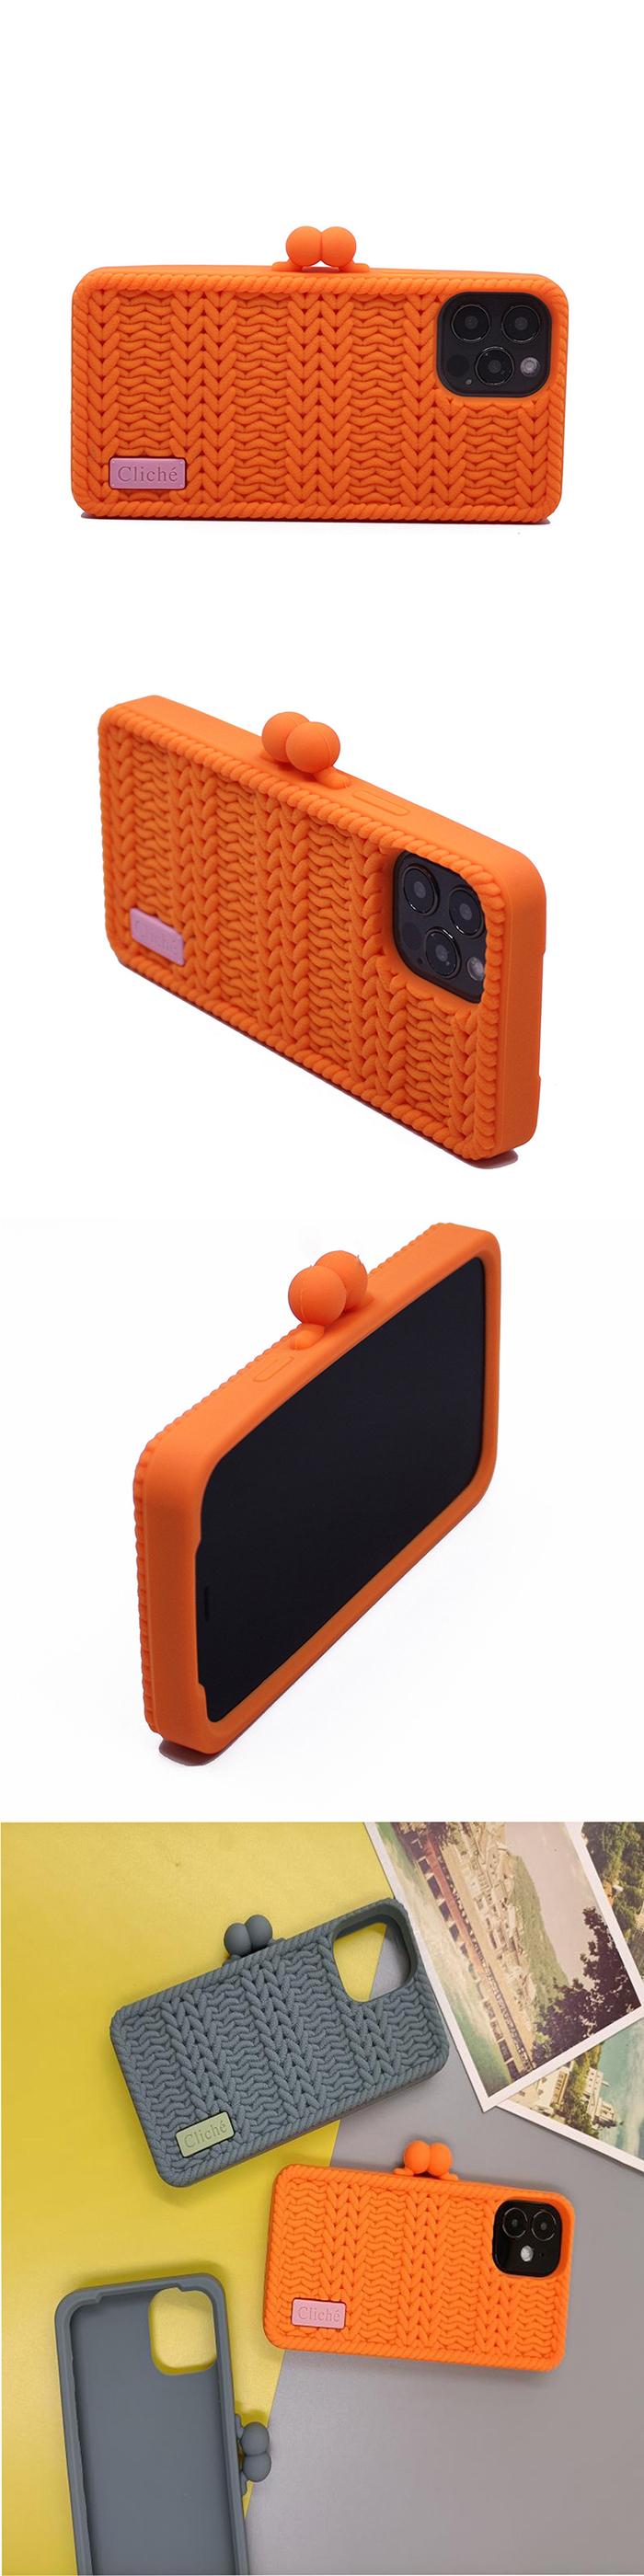 Candies|Cliche針織 雙珠扣錢包(橘) - iPhone 12 Pro Max